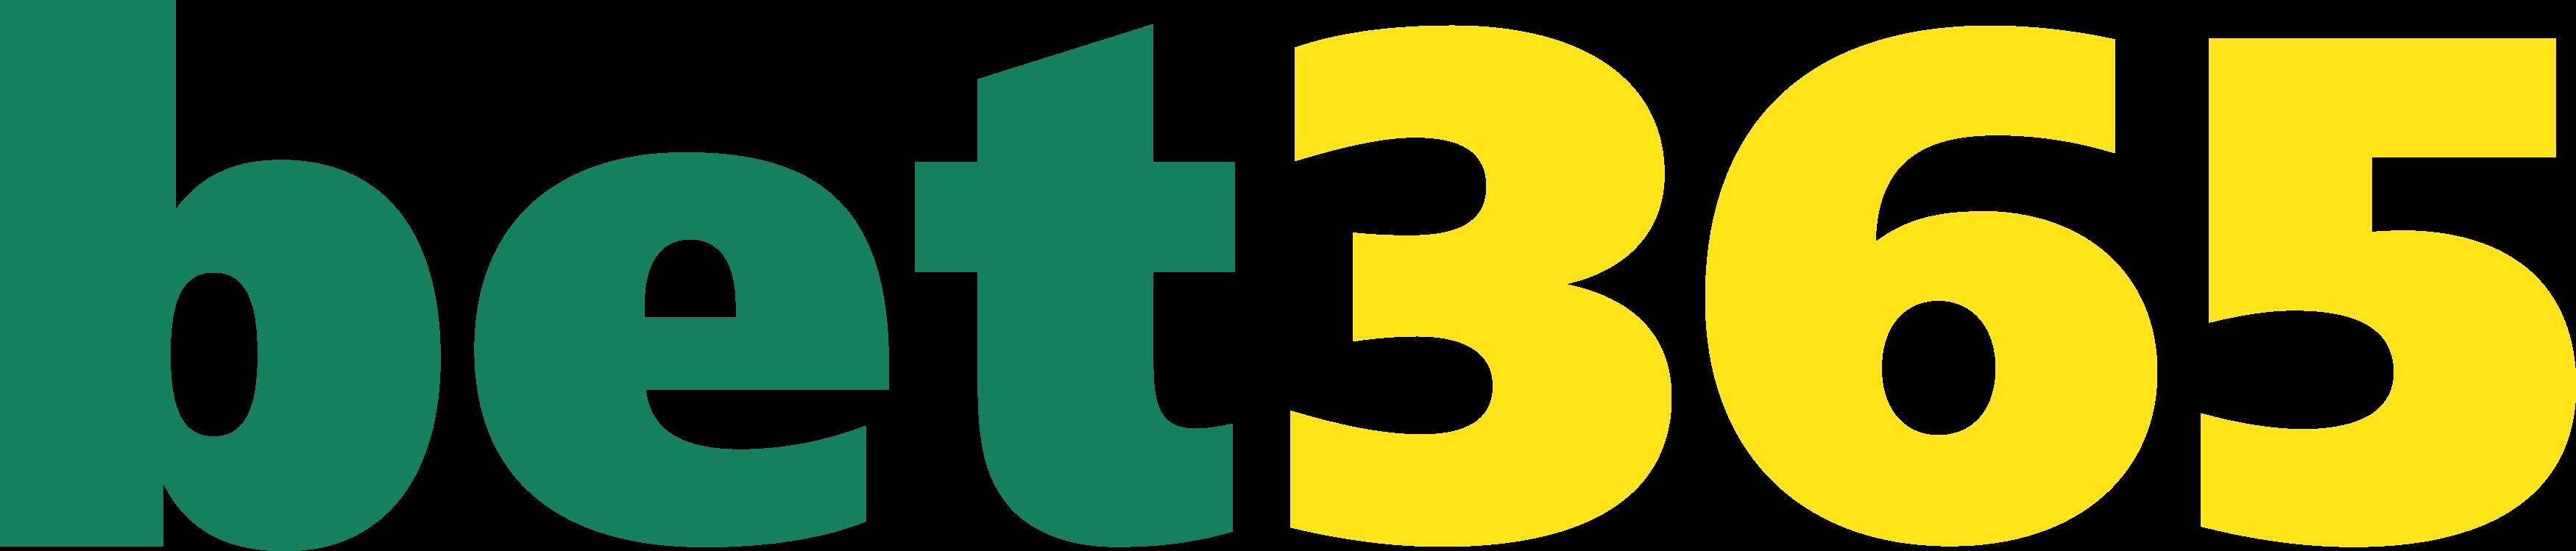 bet365 Logo.